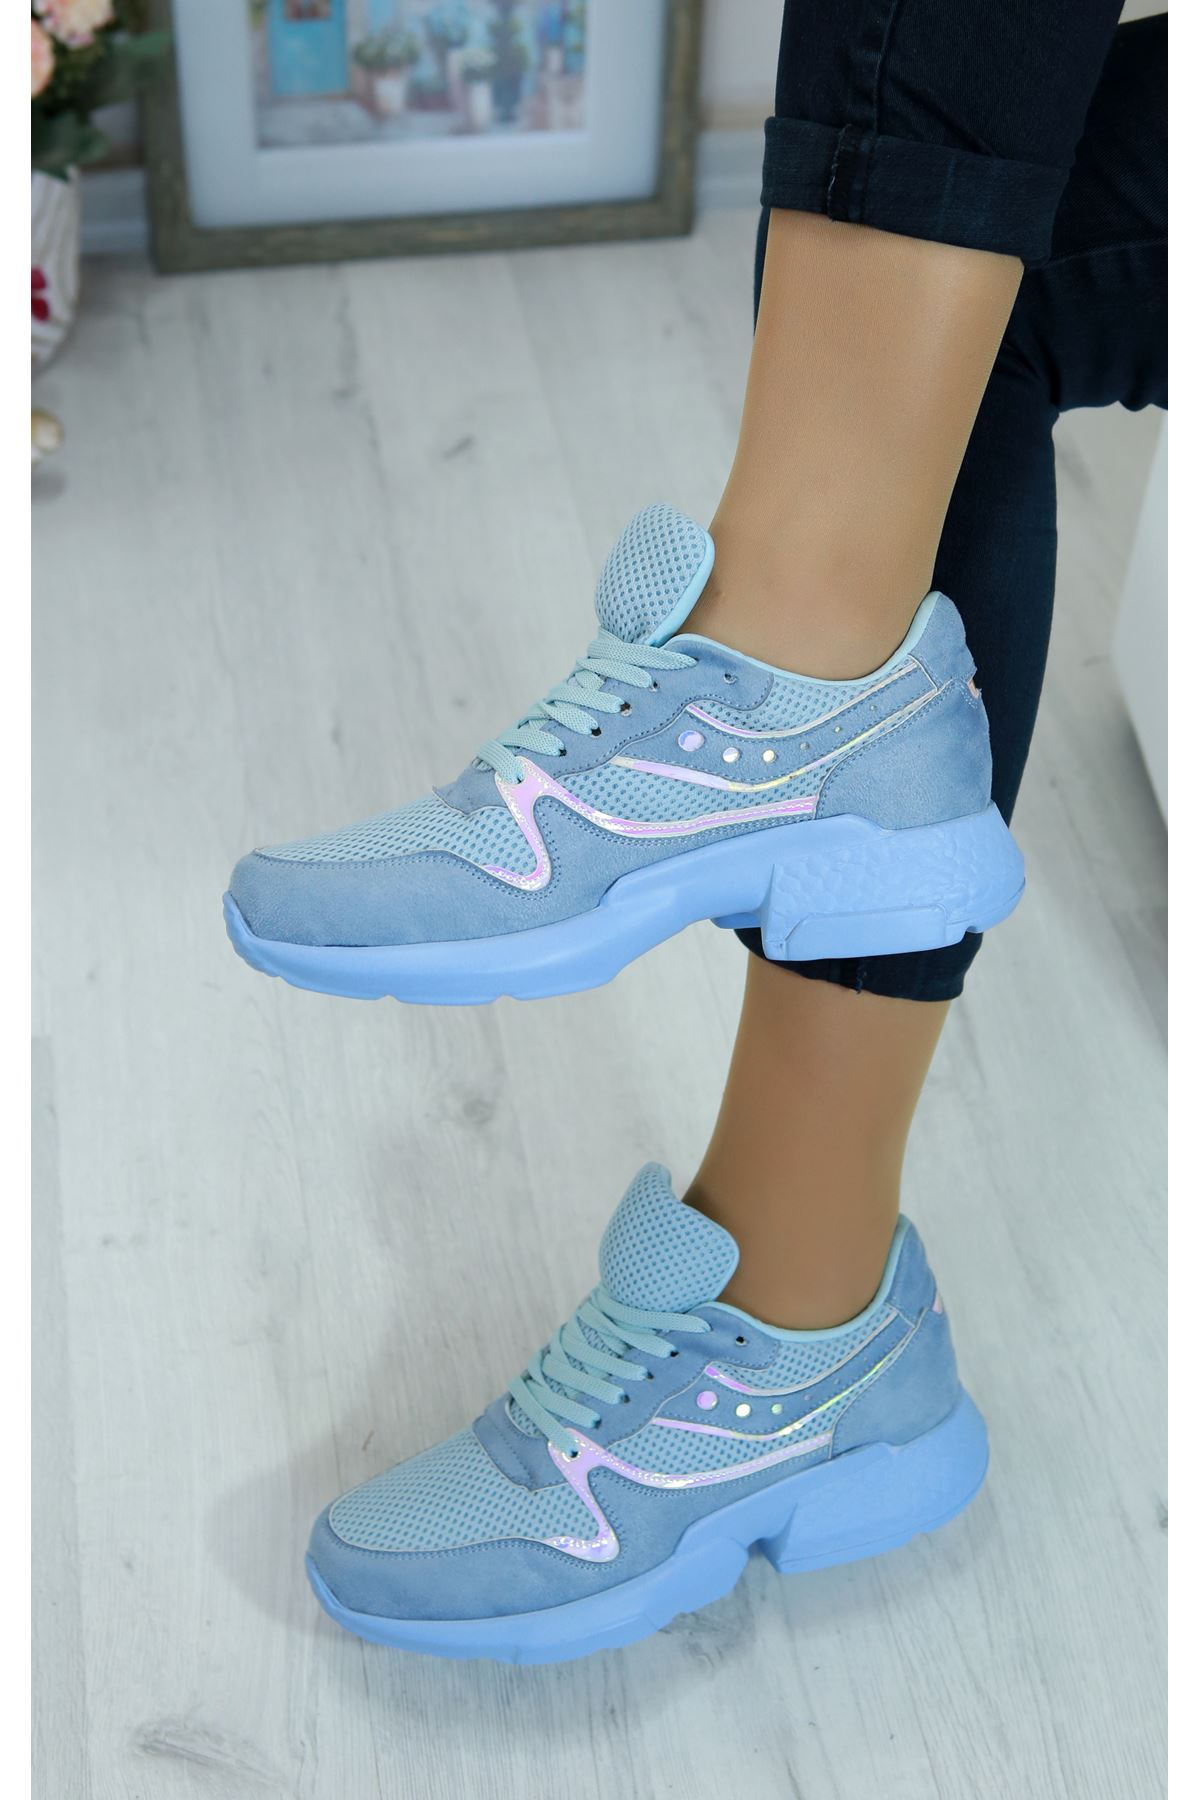 Marzo Bebe Mavi Lame İthal Süet Bayan Spor Ayakkabı